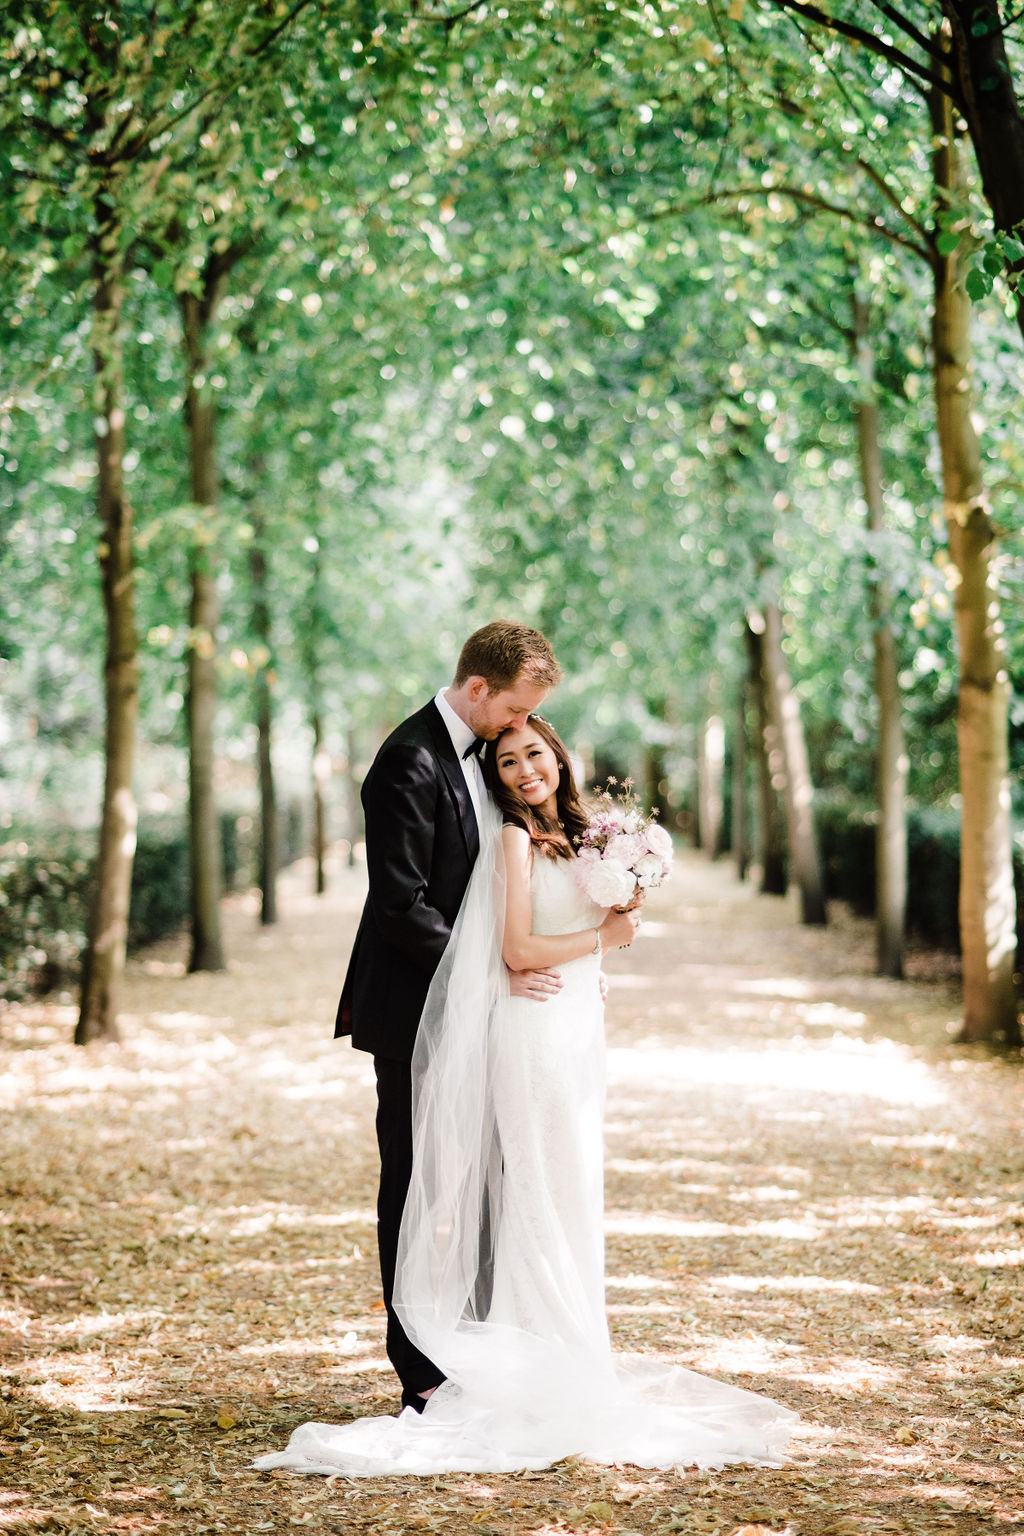 Romantic wedding couple portrait at Chiswick House